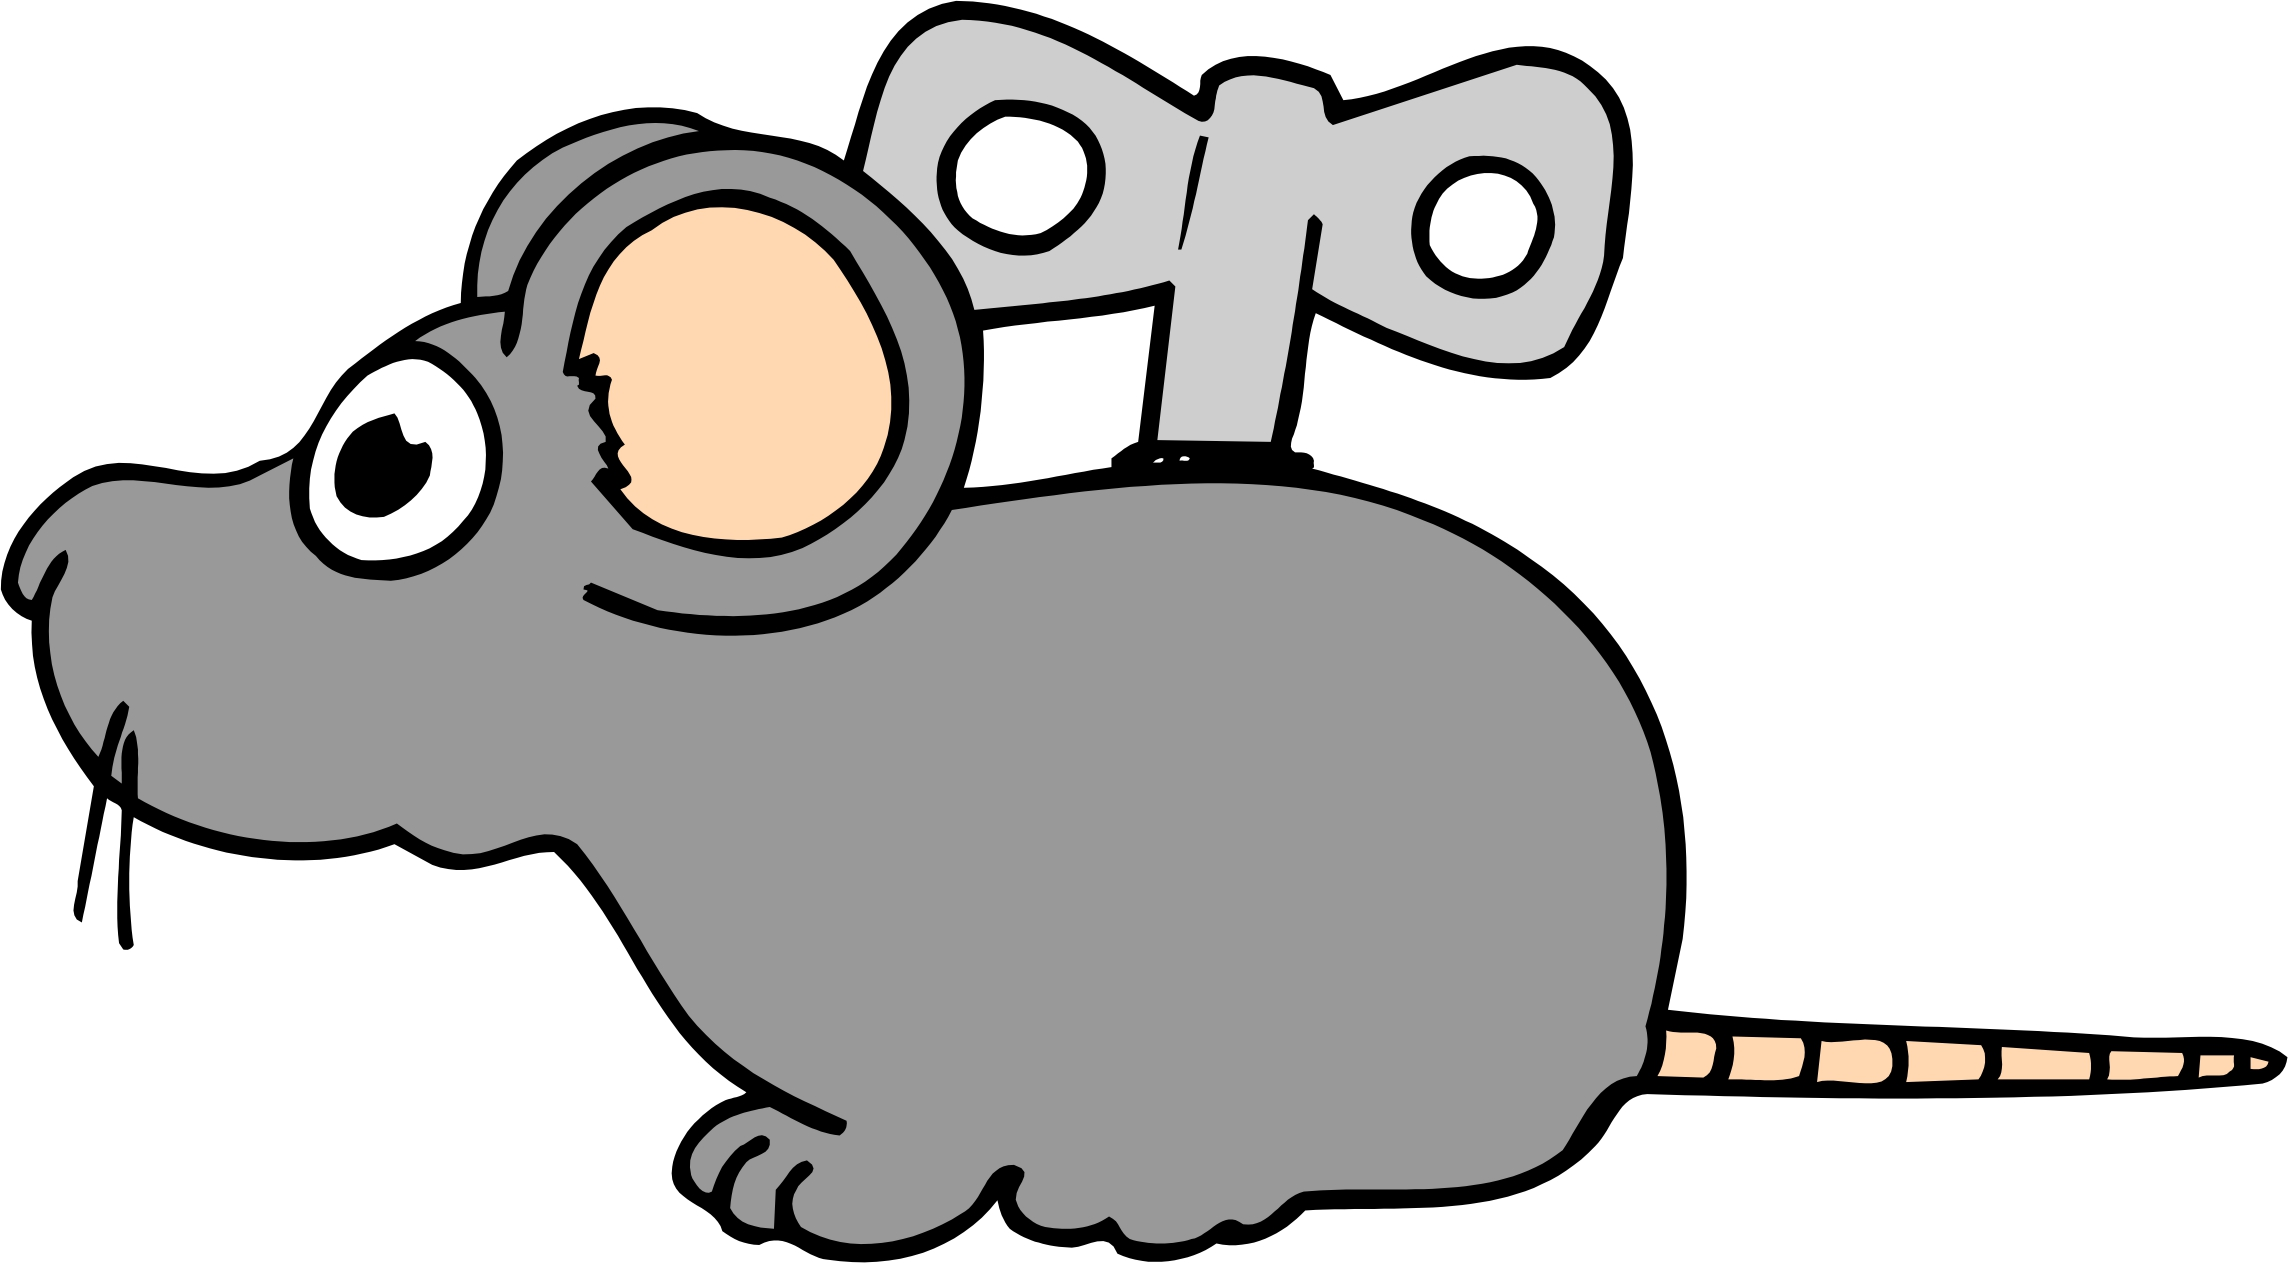 Cartoon Mouse | Page 4 - ClipArt Best - ClipArt Best